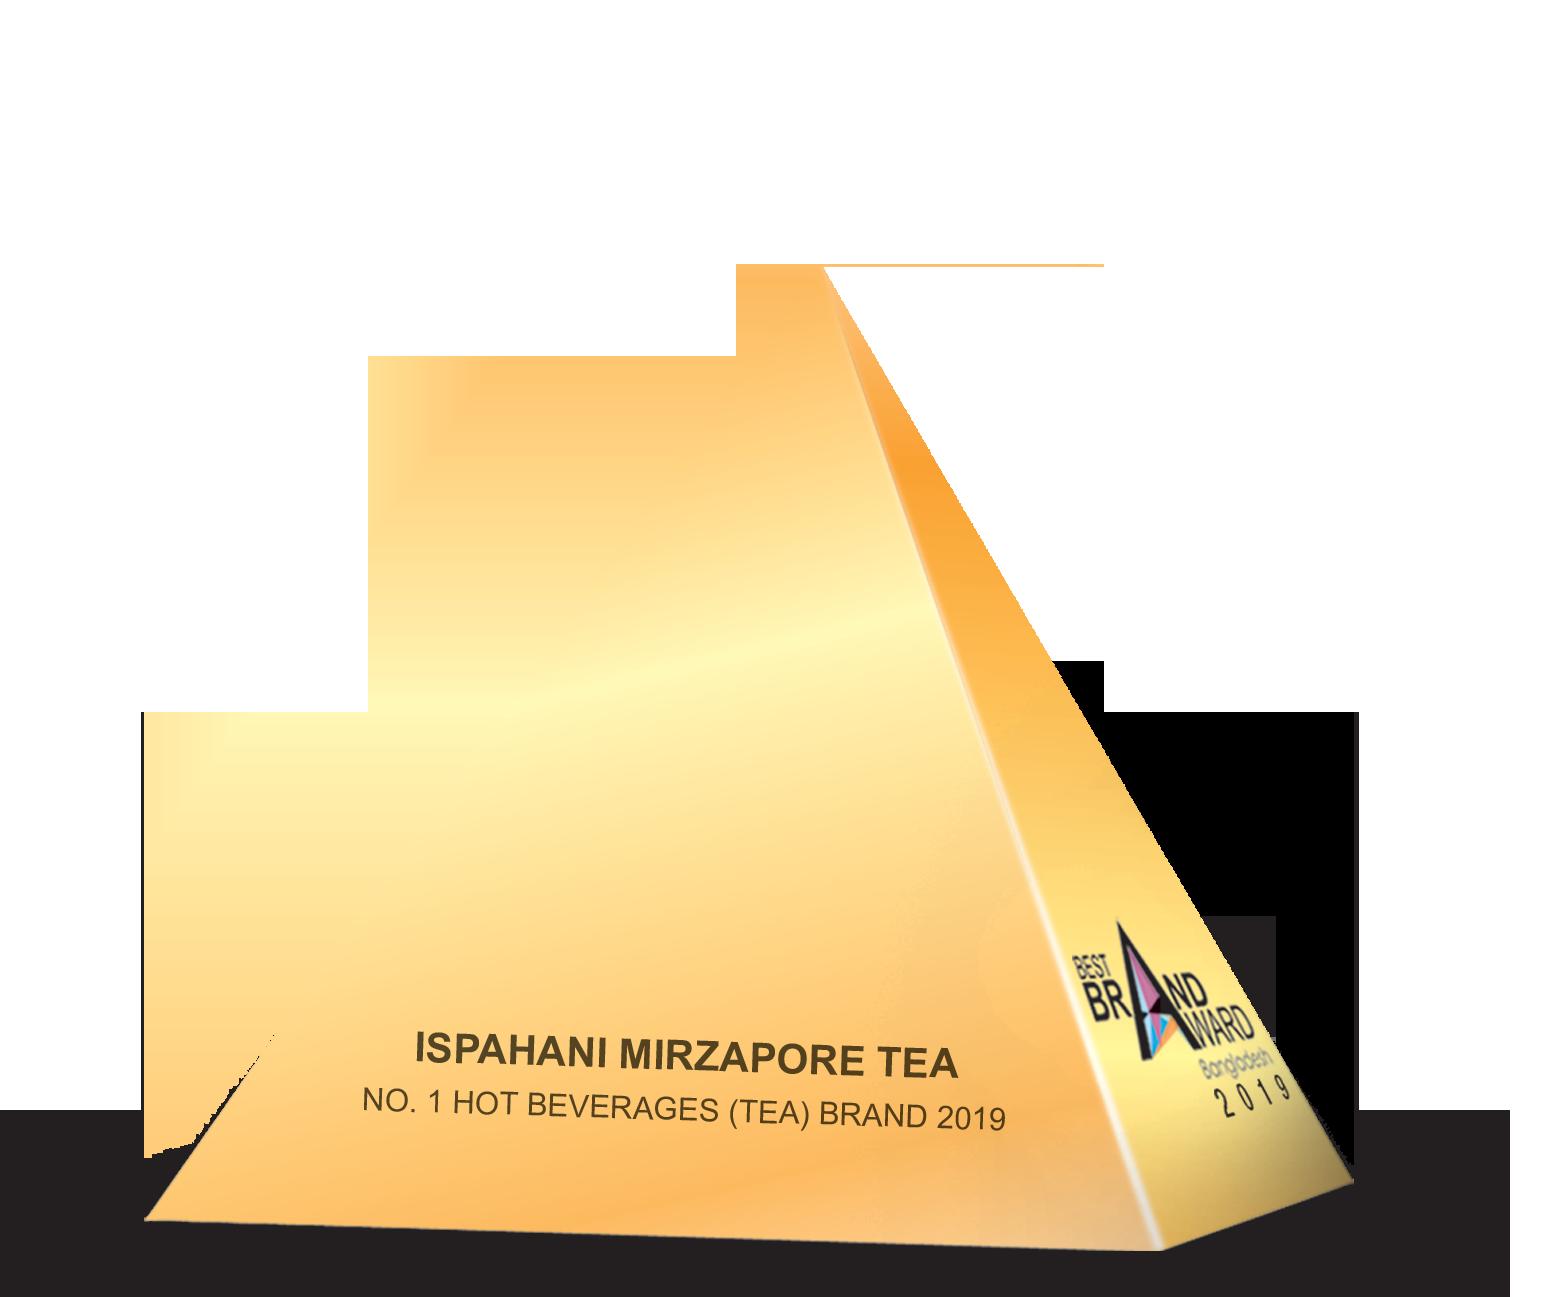 Ispahani Mirzapore Tea